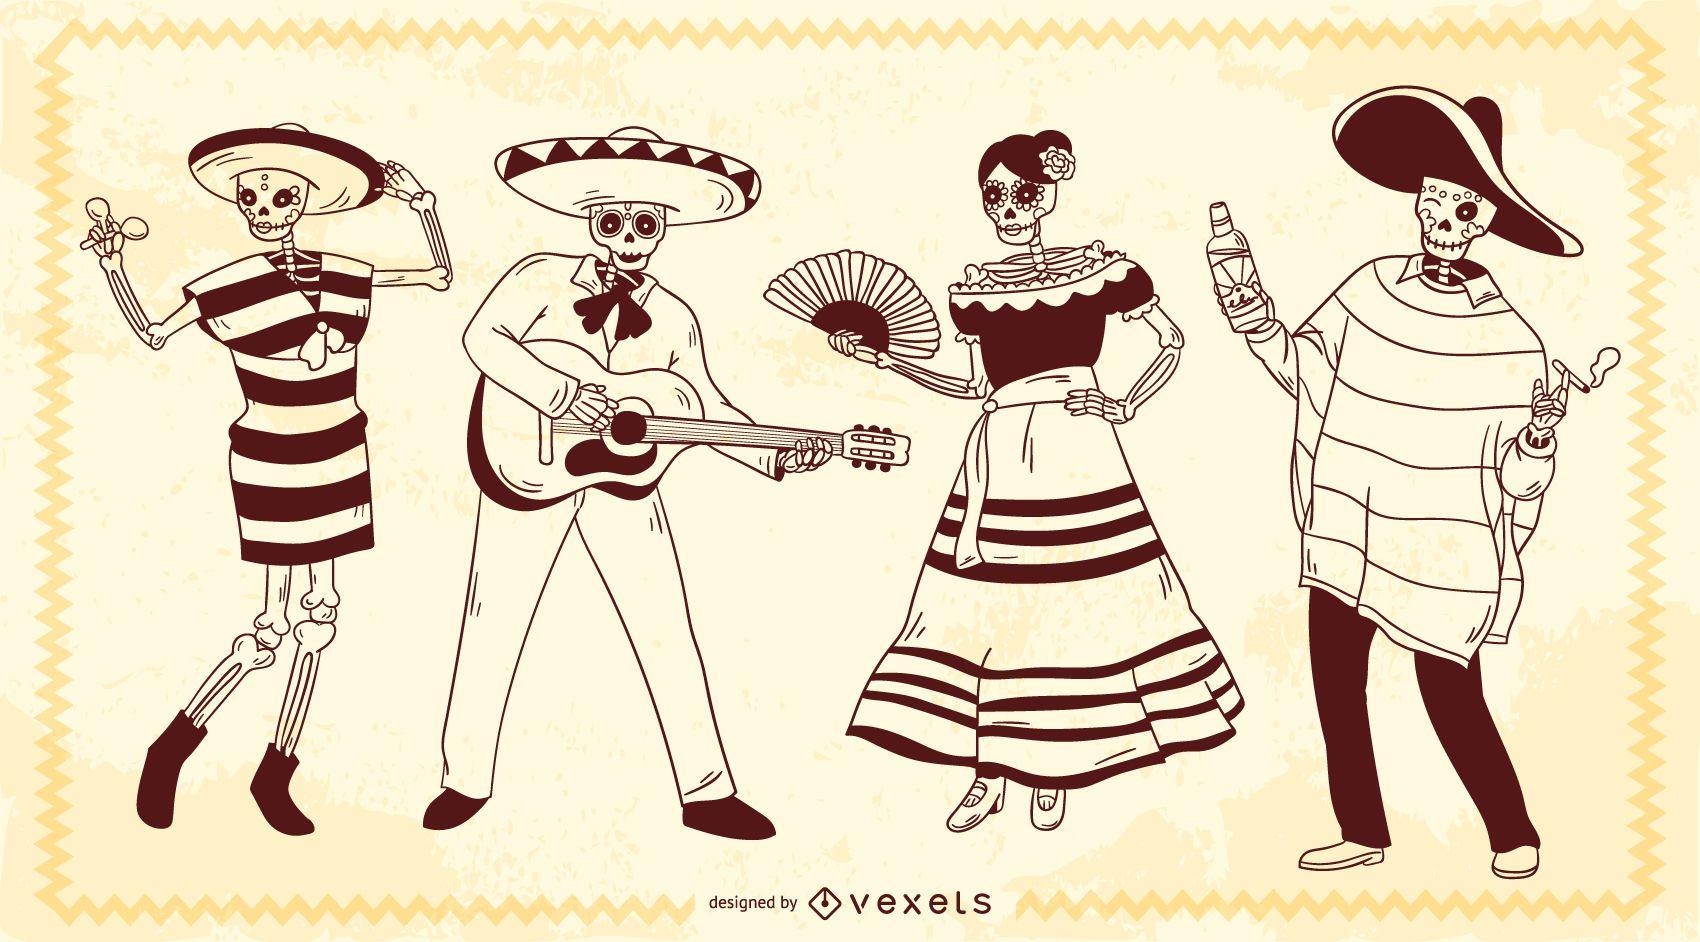 Personajes de trazo de esqueleto mexicano